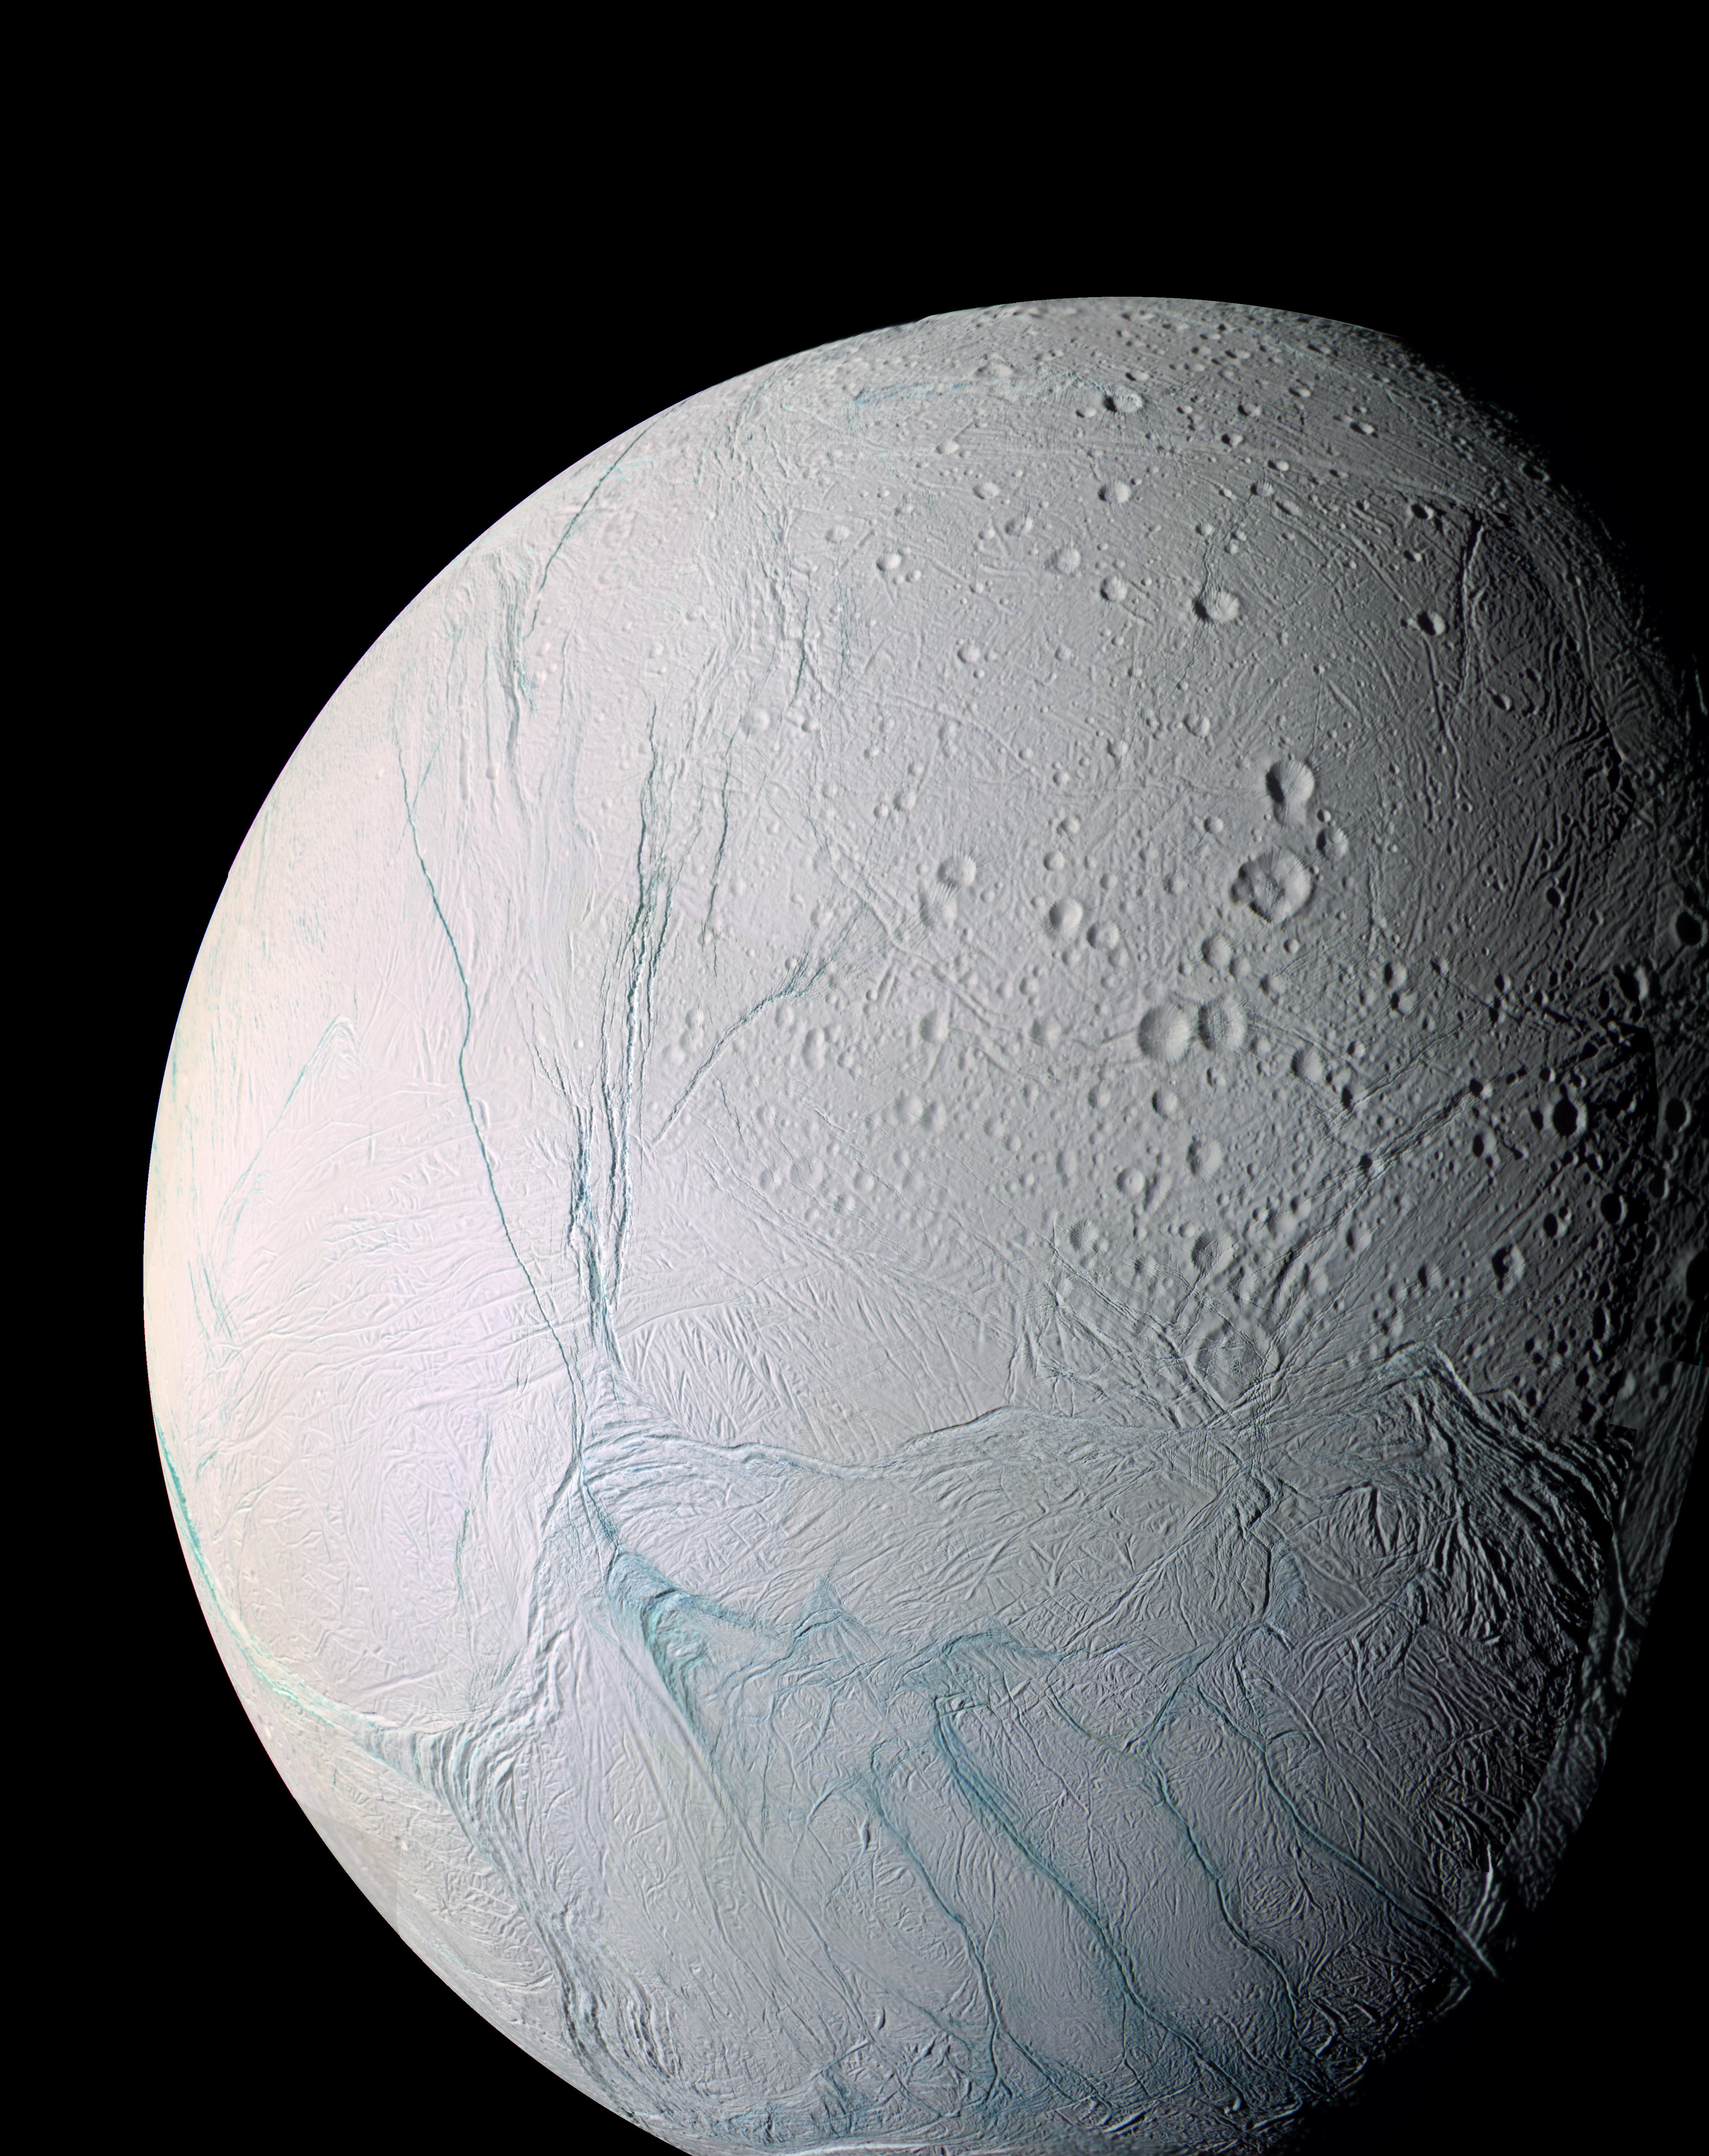 Saturn's icy moon - Enceladus